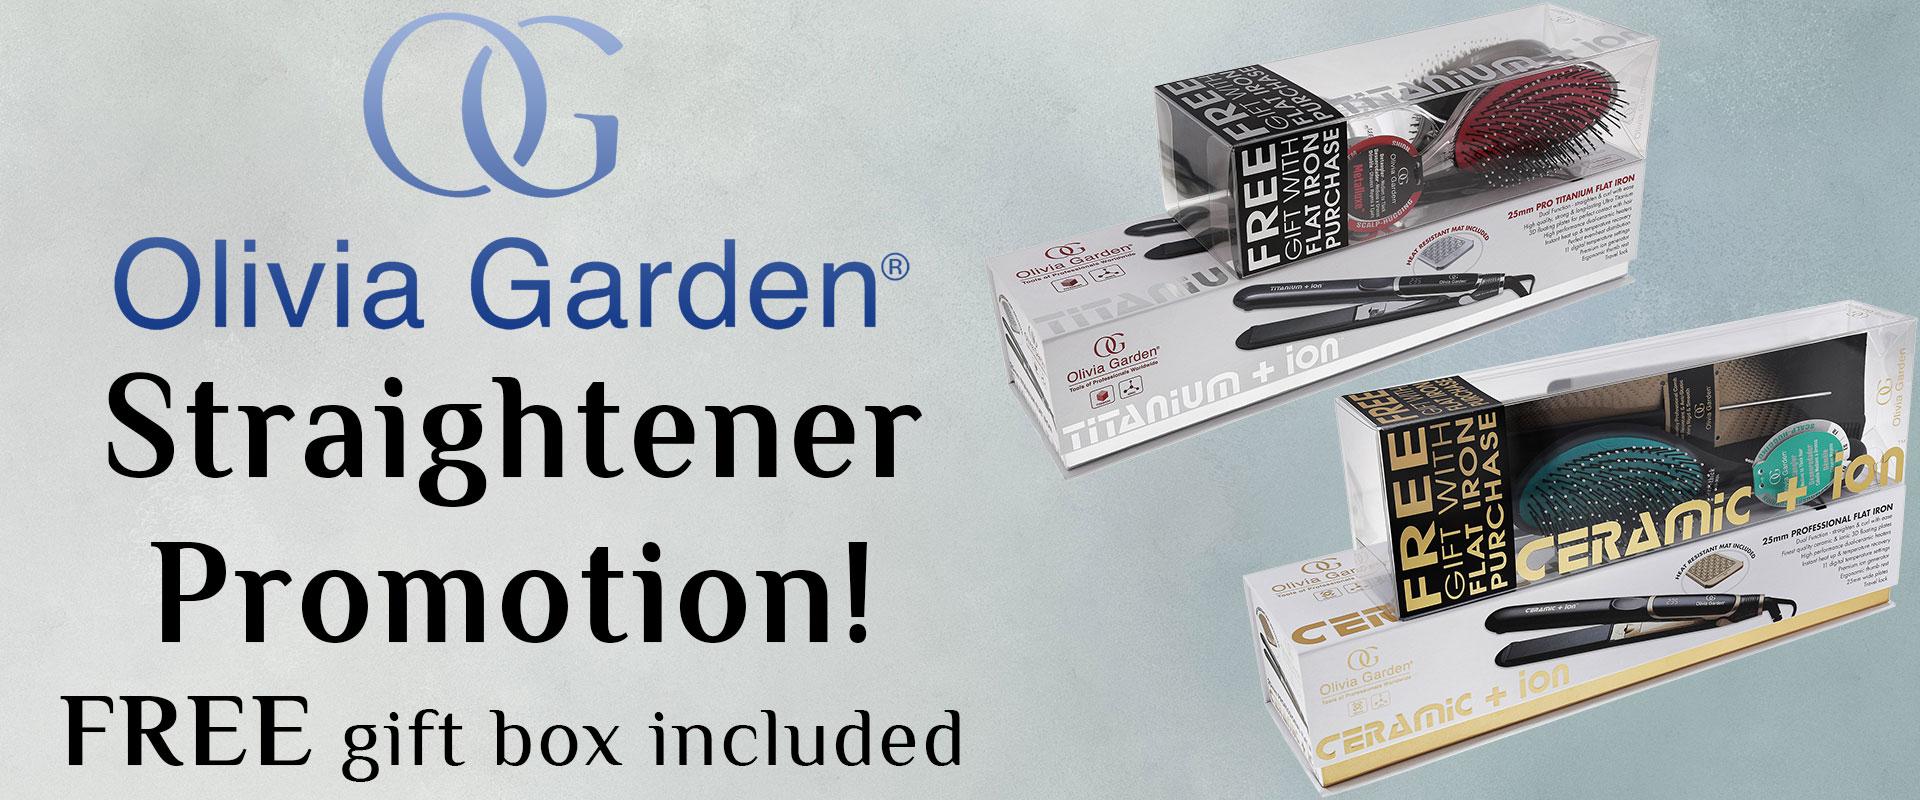 Olivia Garden Hair Straightener Promotion